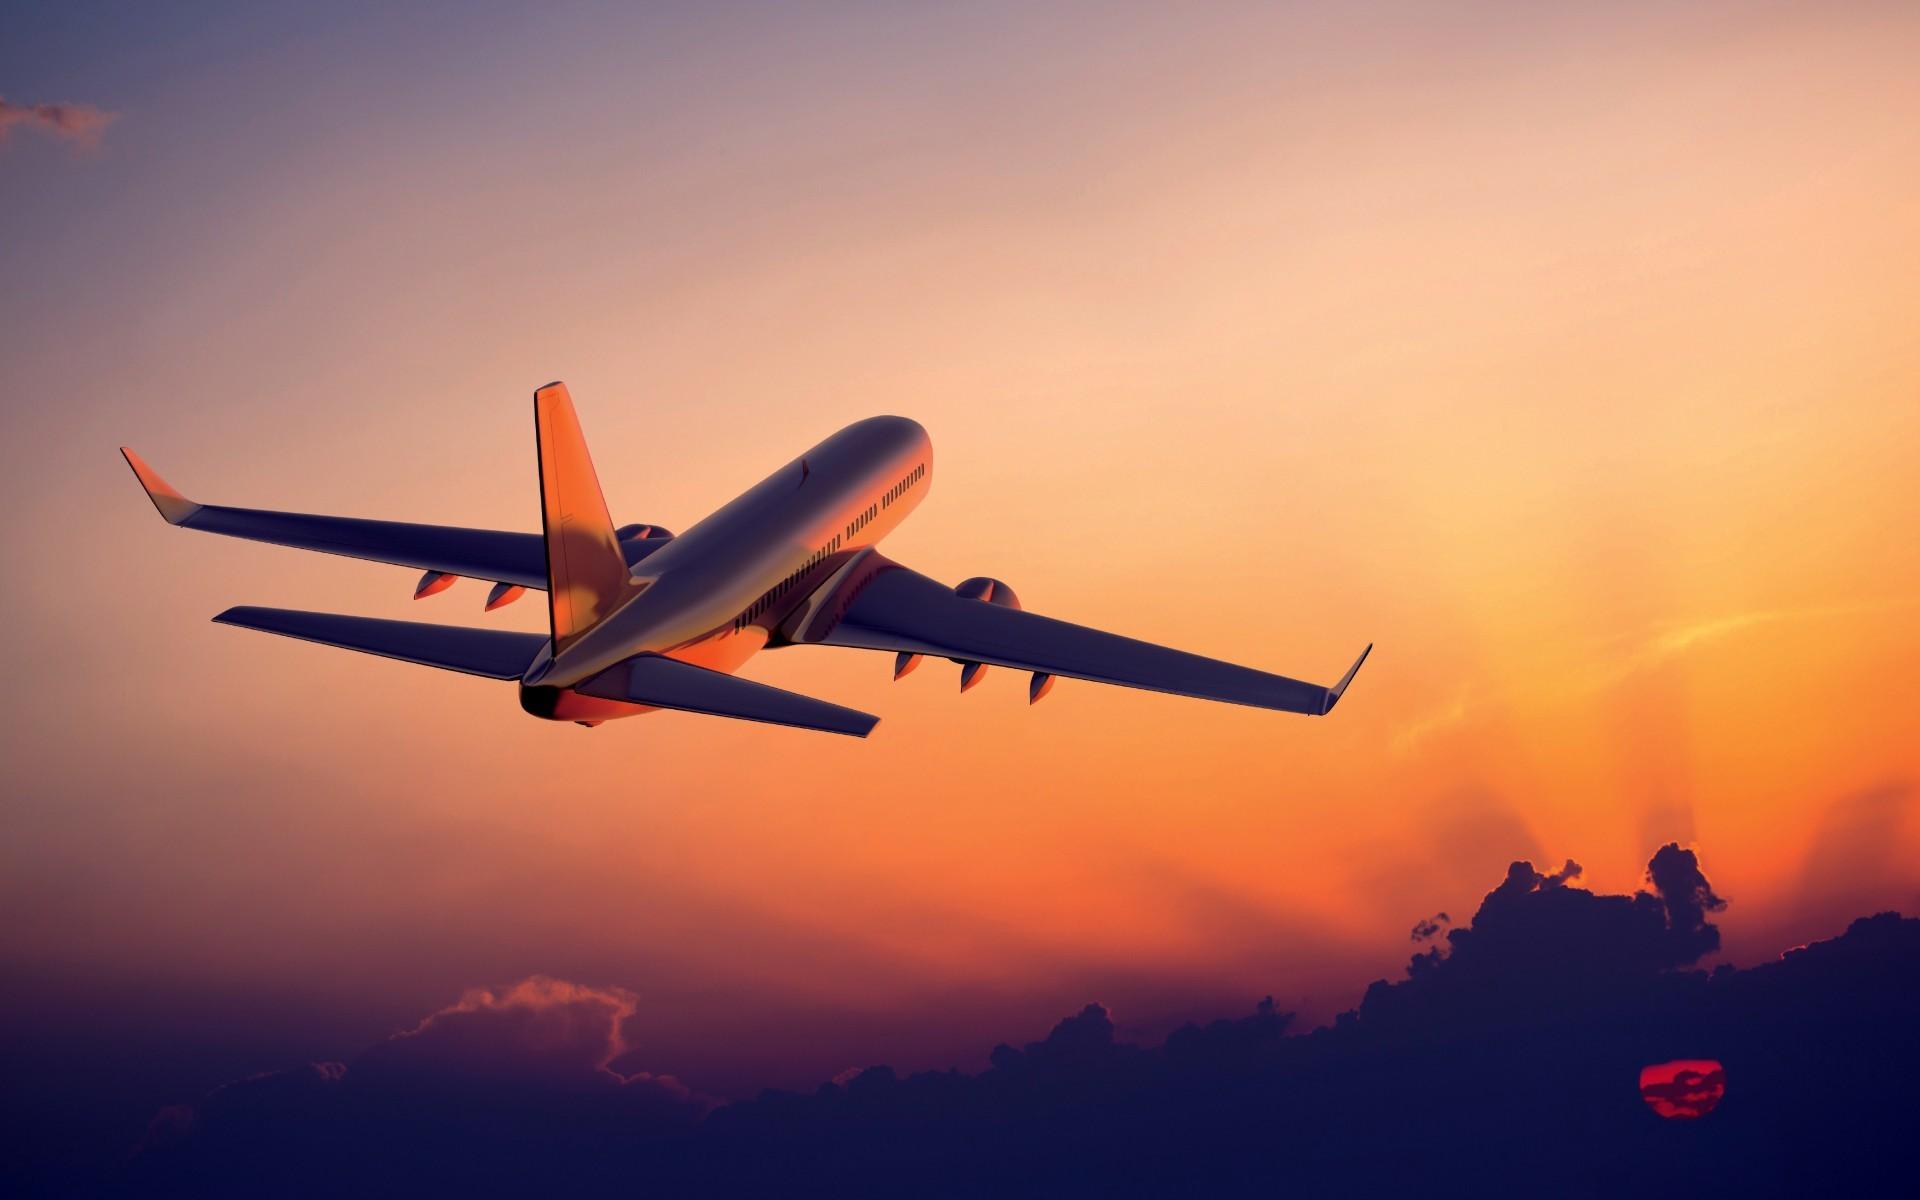 World / Airplane Wallpaper